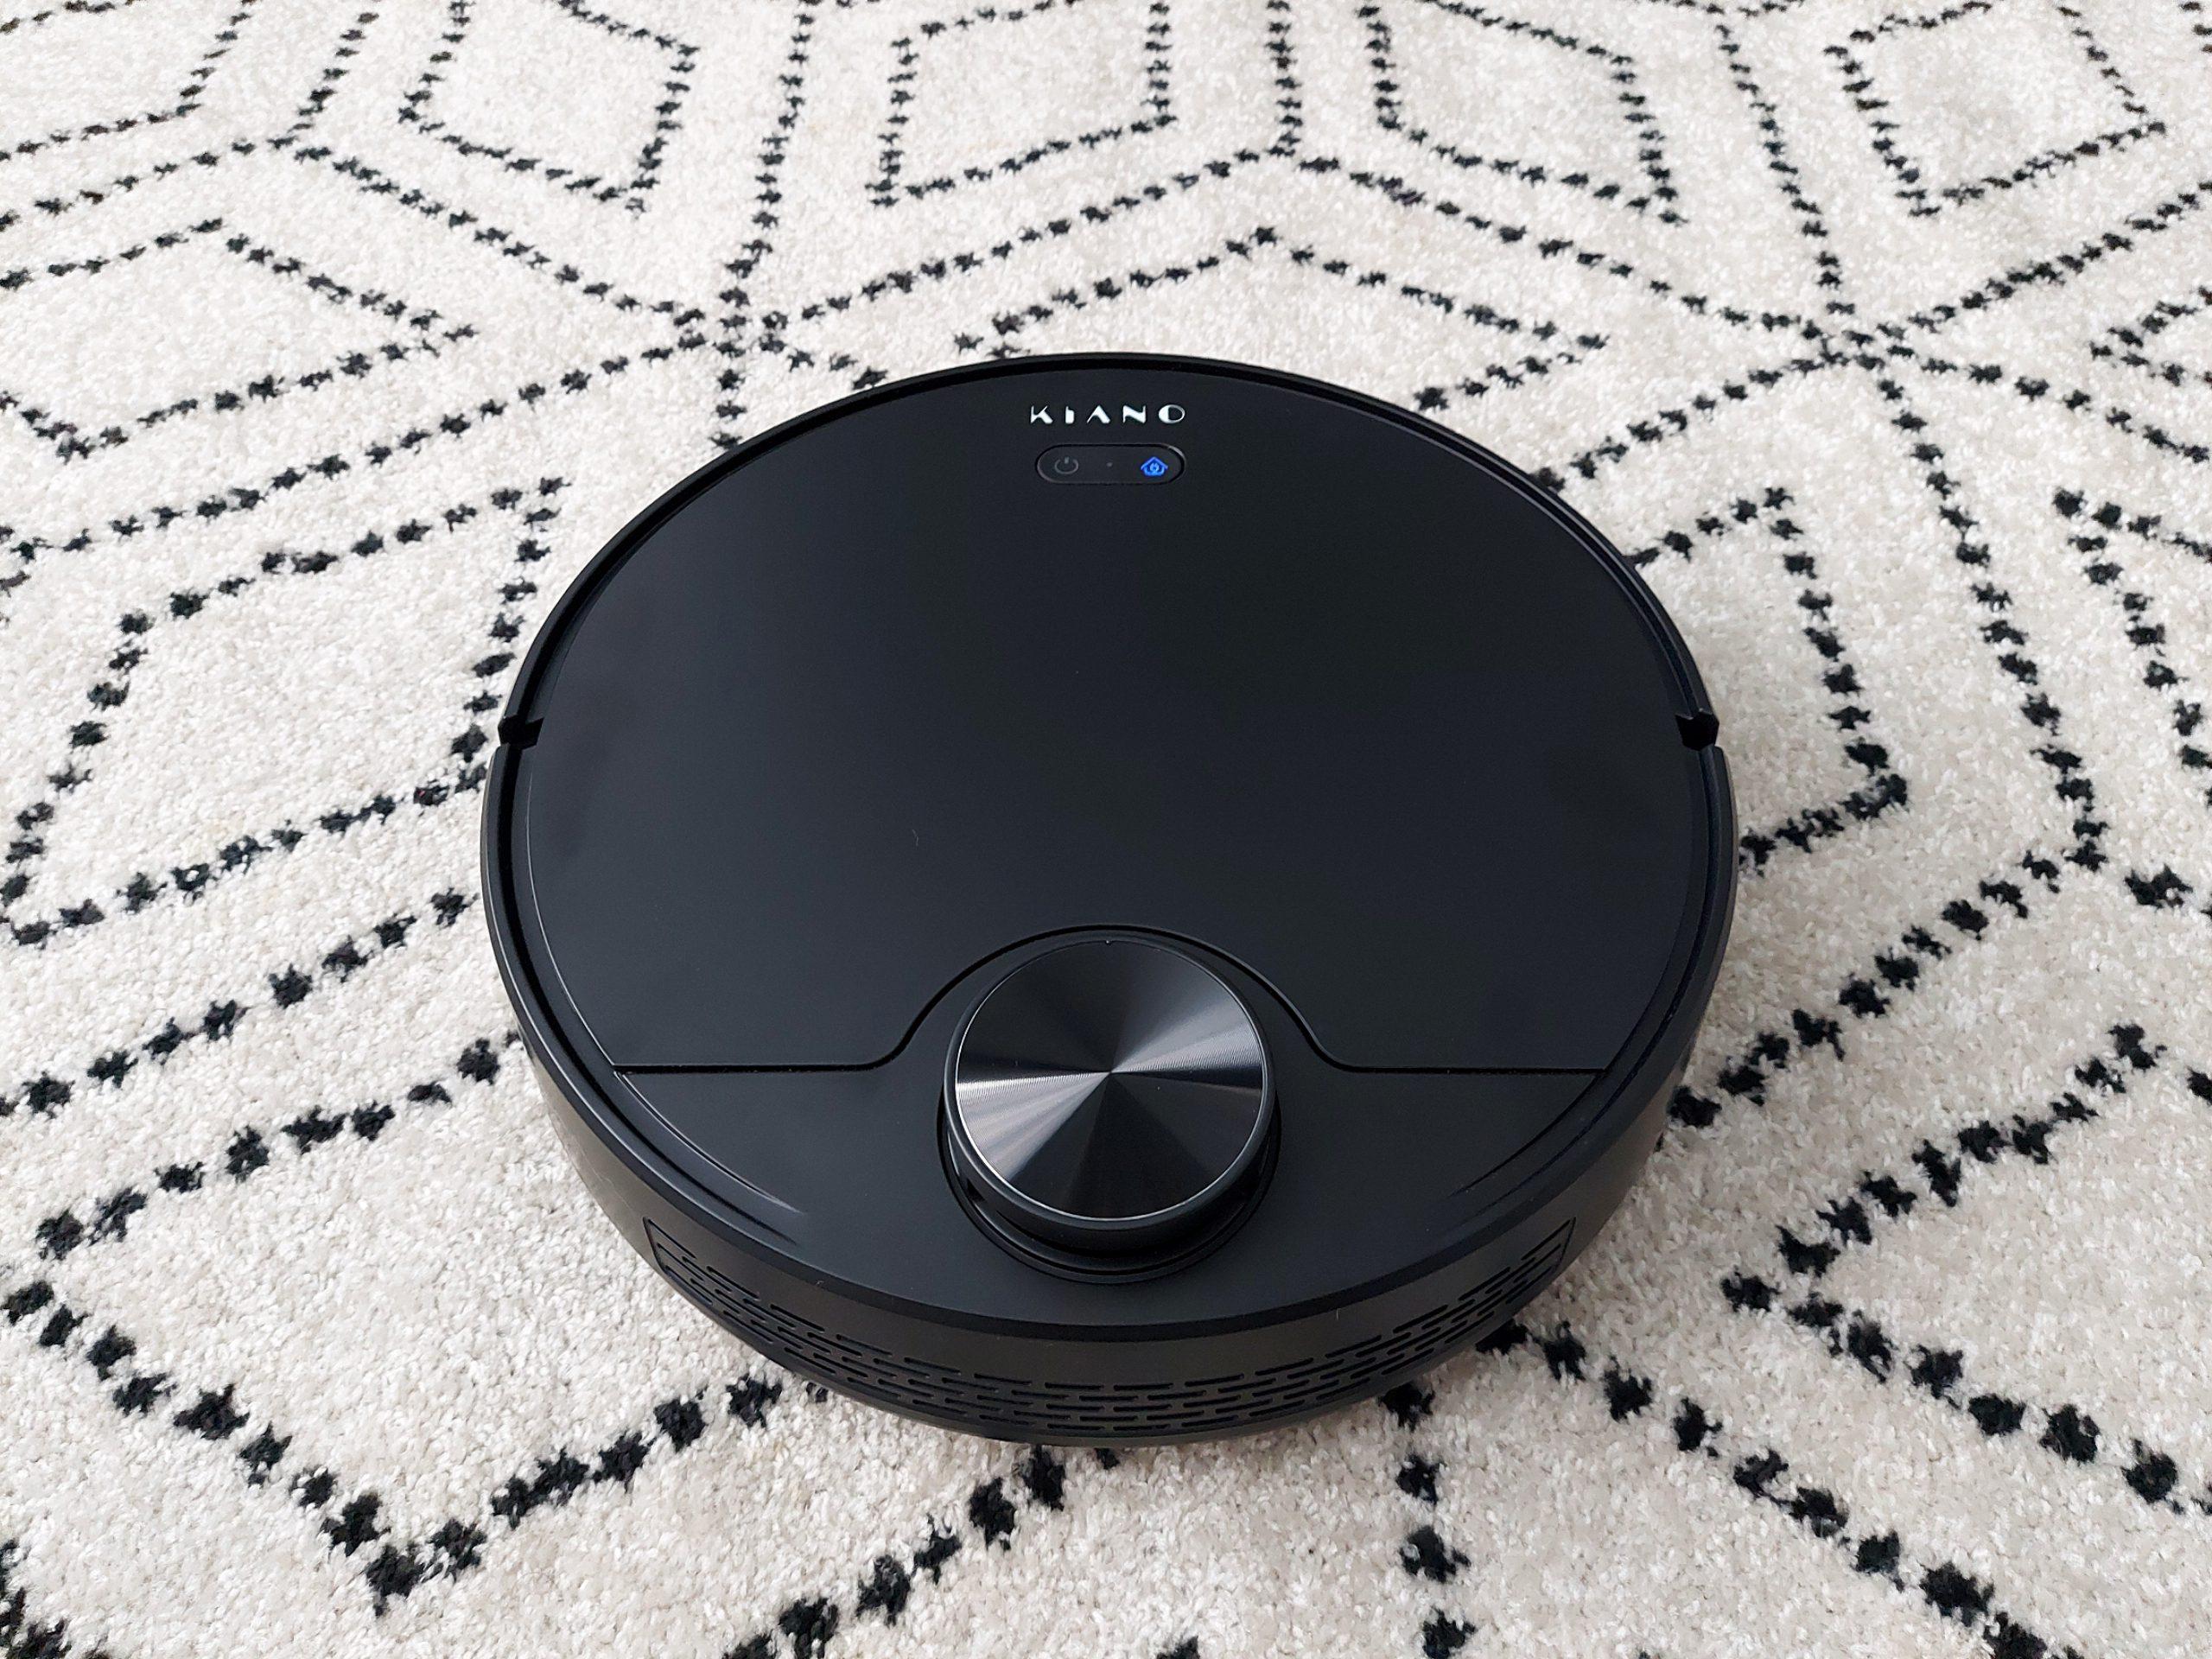 Kiano Elegance Robot radar